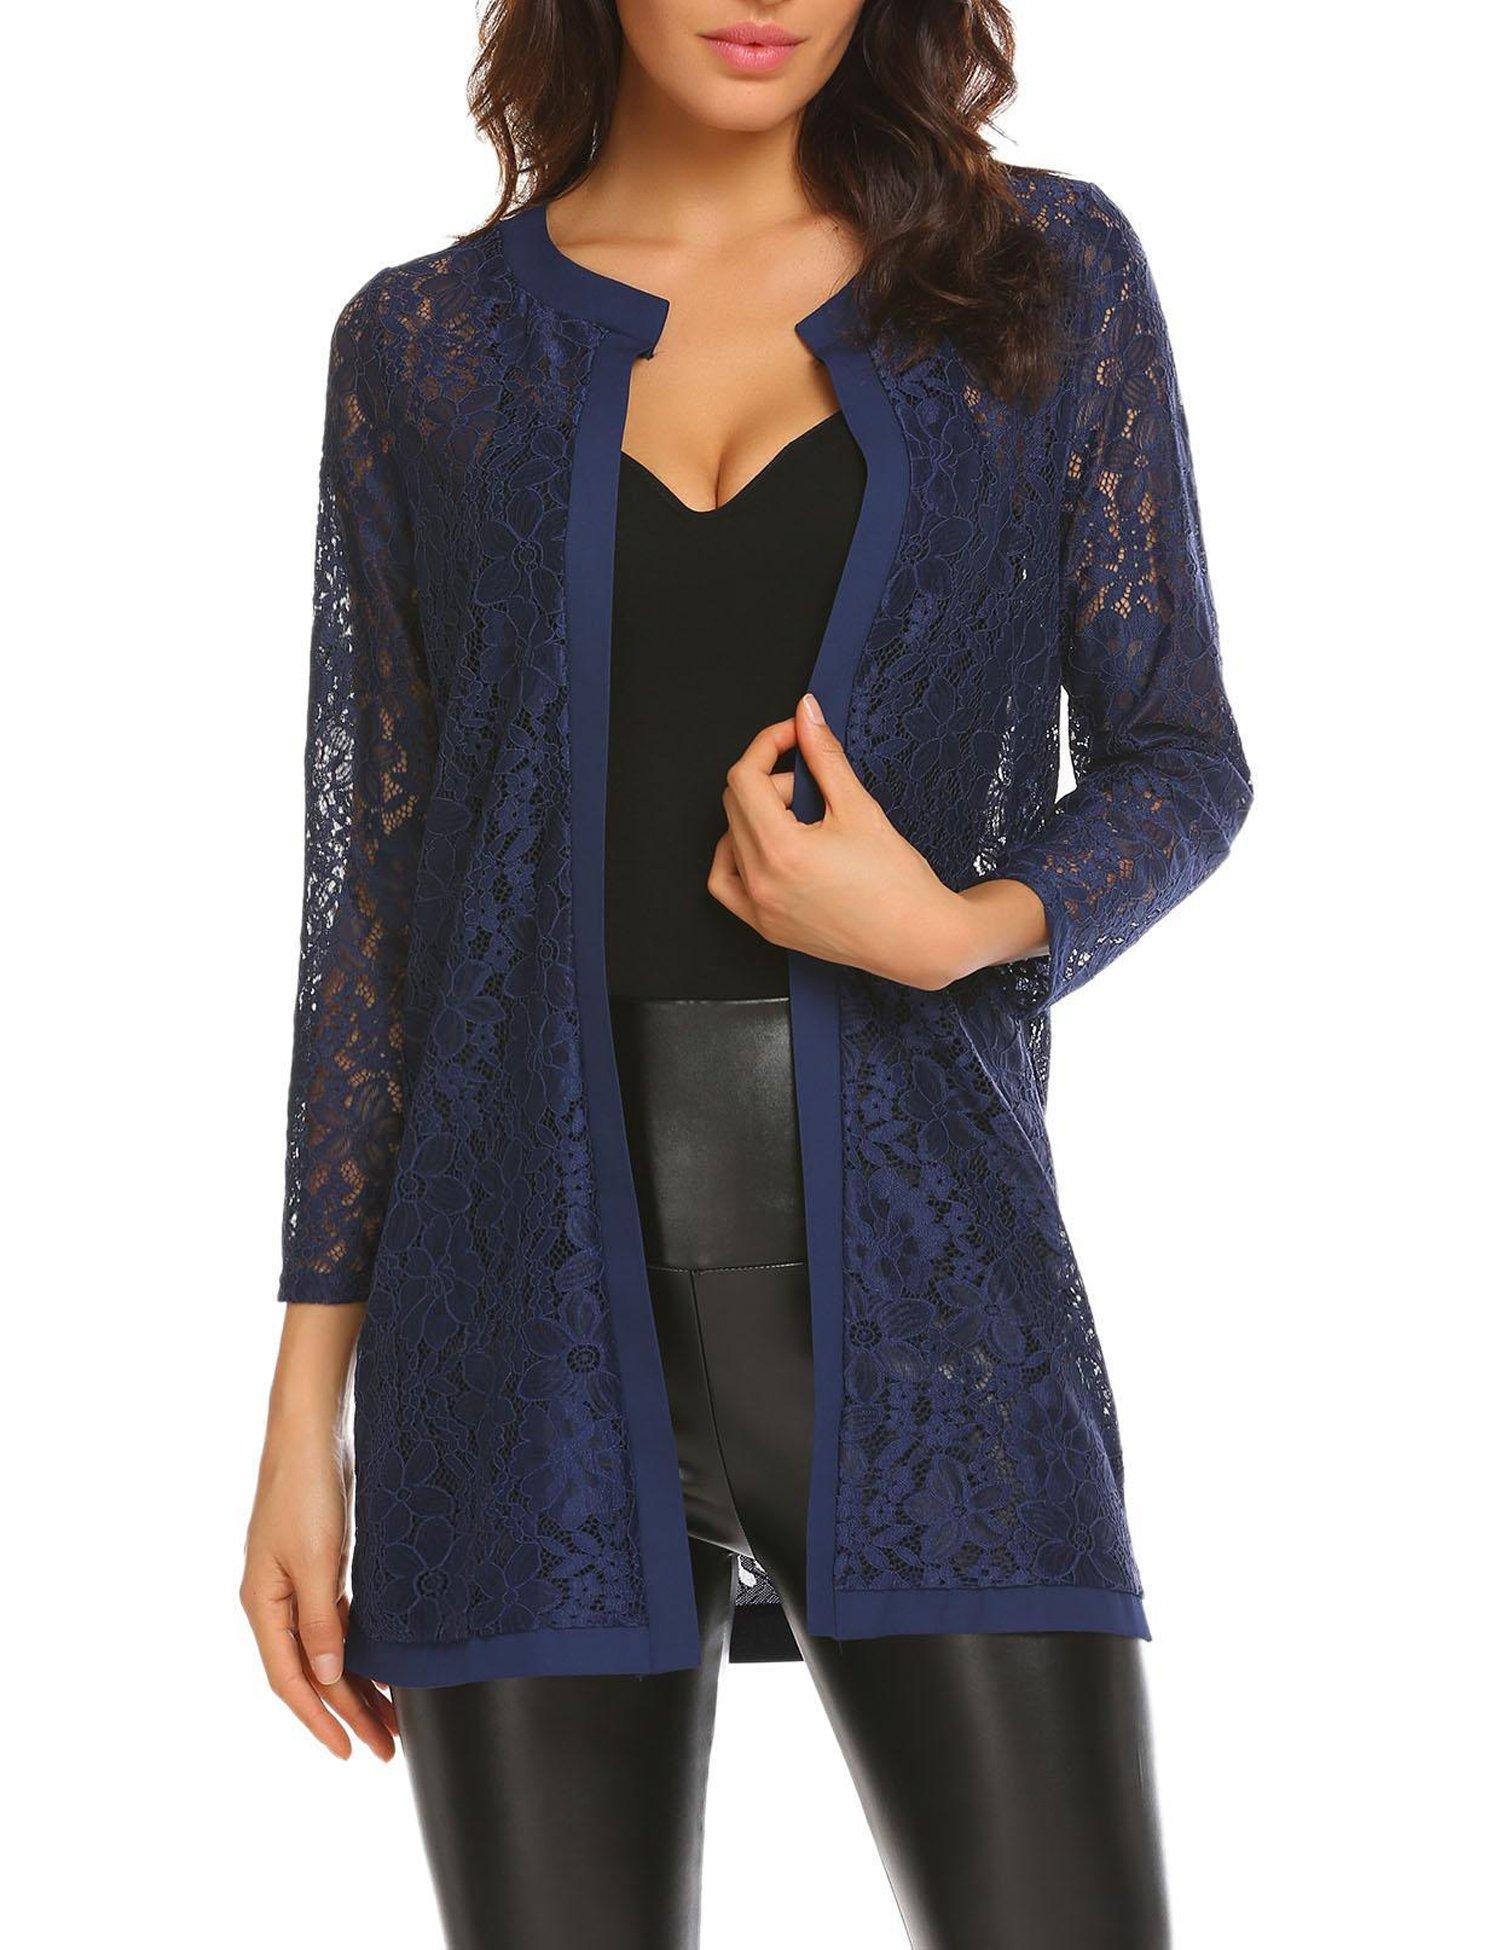 Bulges Women Floral Lace Cardigan Shrug 3 4 Sleeve Front Open Bolero Blouse Crop Top Blue XX-Large